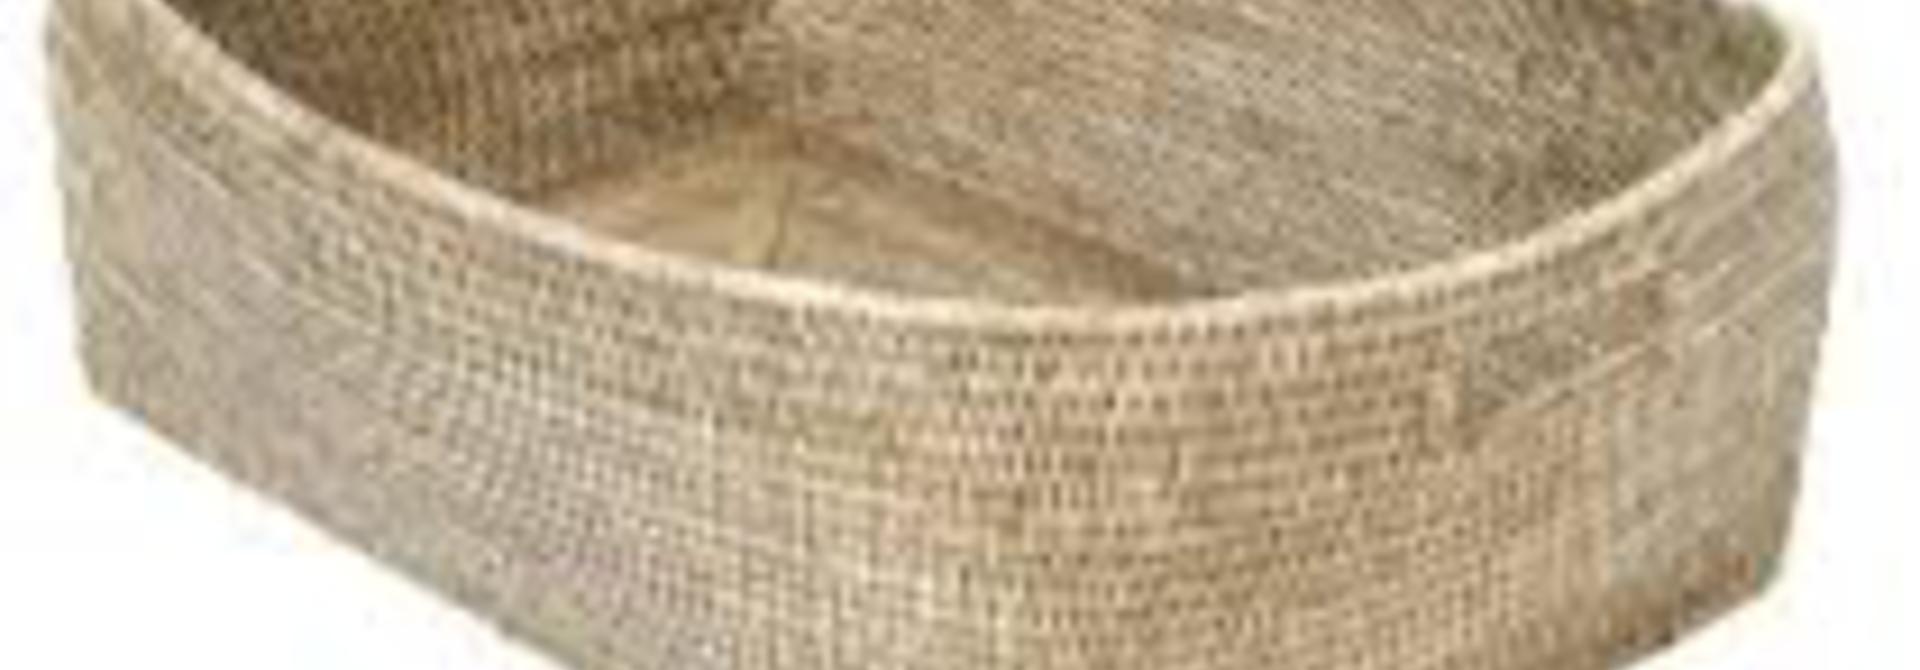 PAGAN - Escale Ceruse Rattan Basket 65x44x21cm